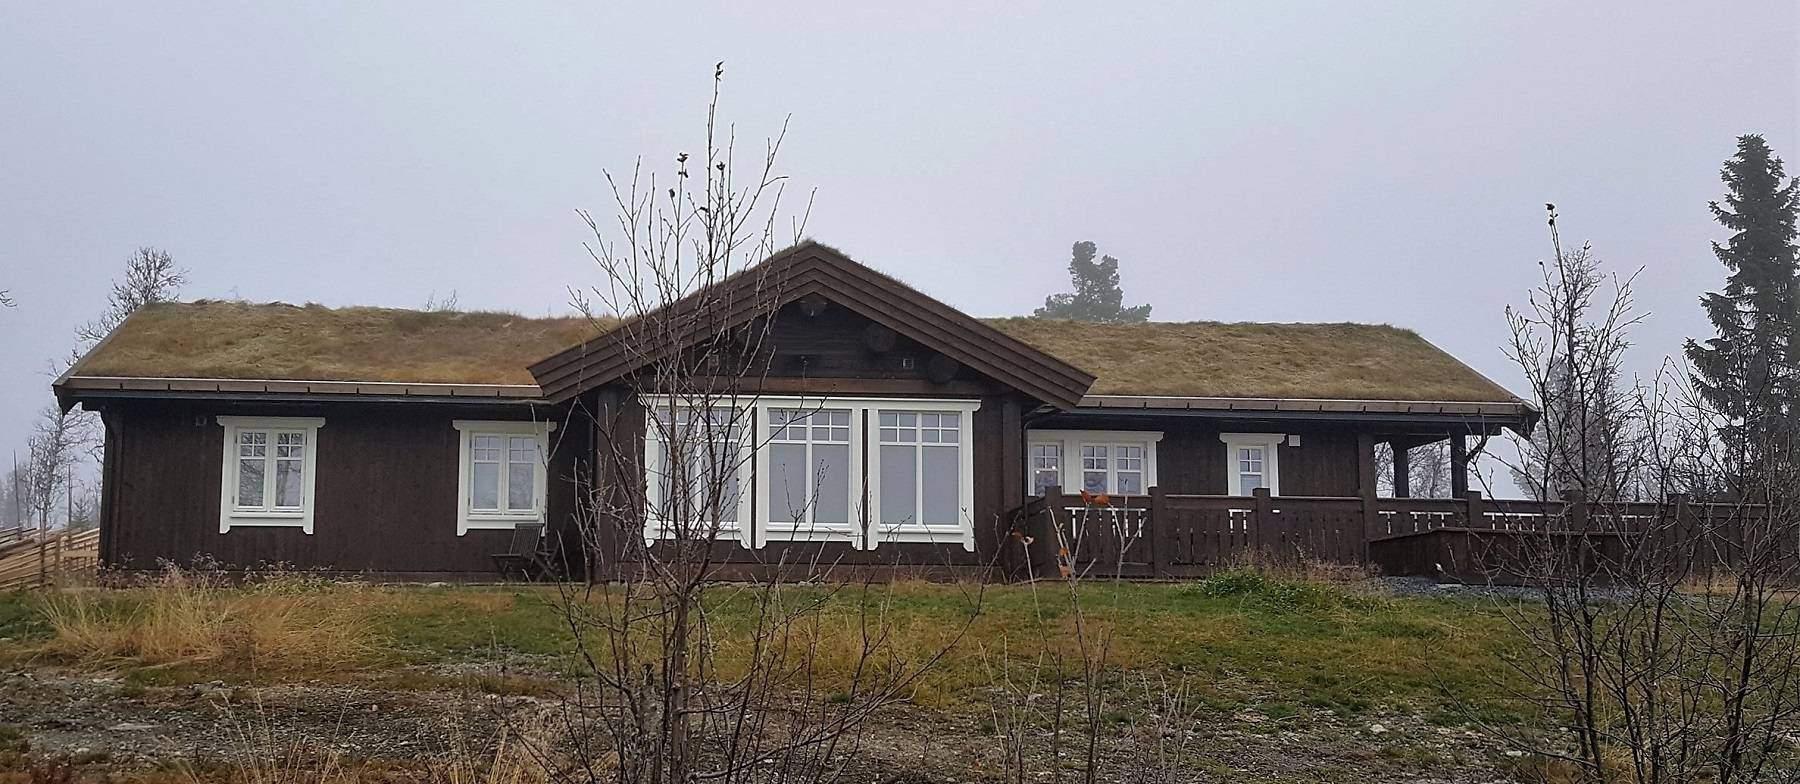 02 Vaset Snøtind113 167 02